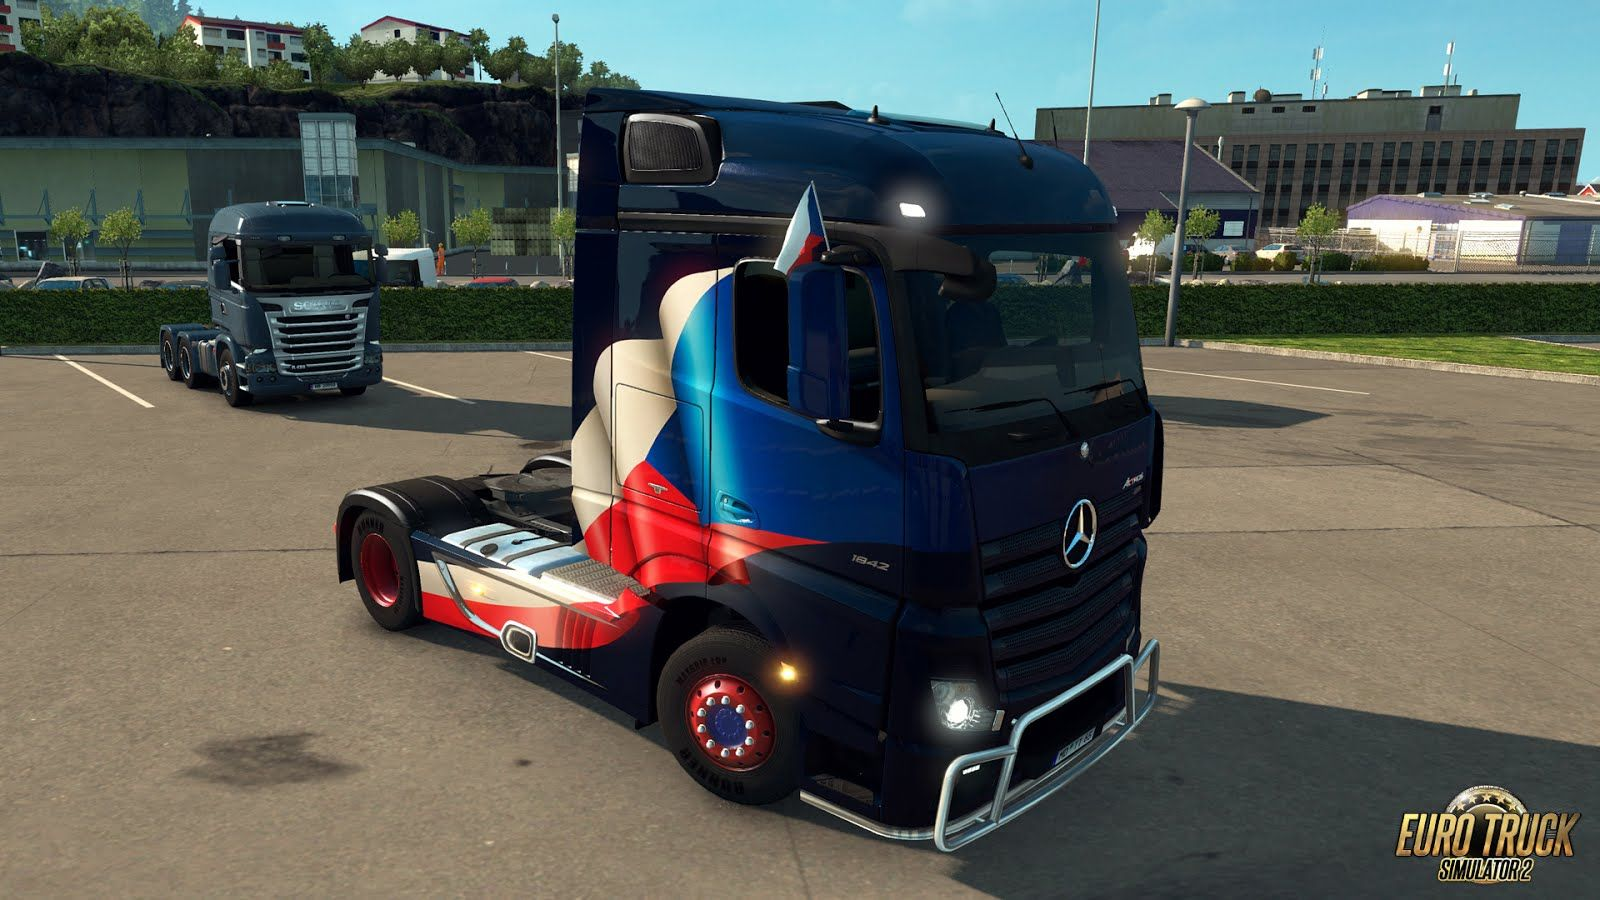 Euro Truck Simulator 2: вышло дополнение National Window Flags